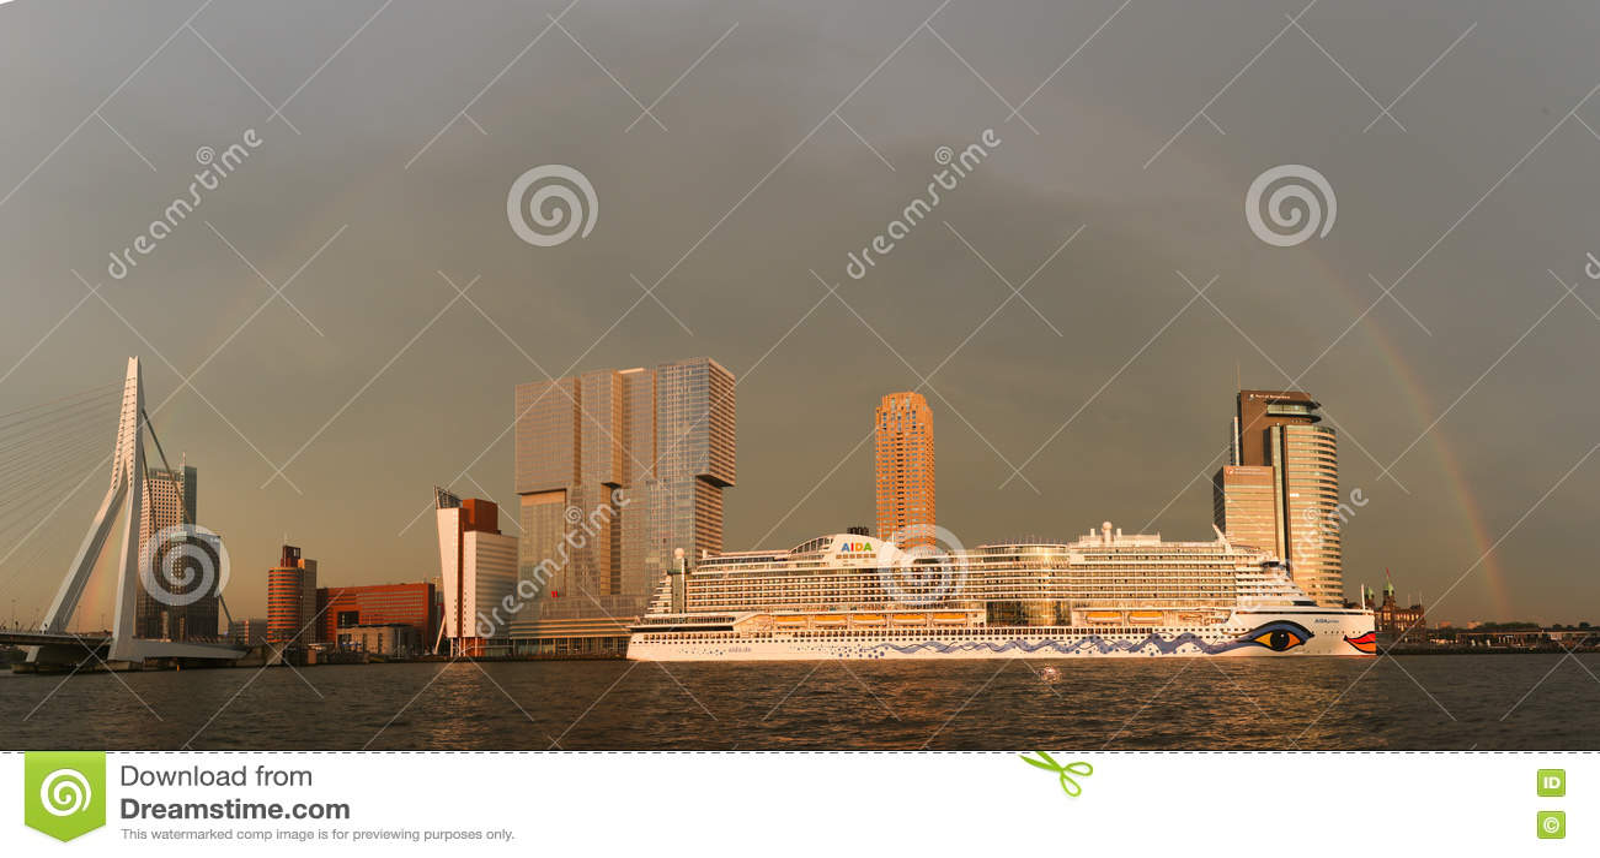 Cruiseship阿伊达在鹿特丹港口靠了码头